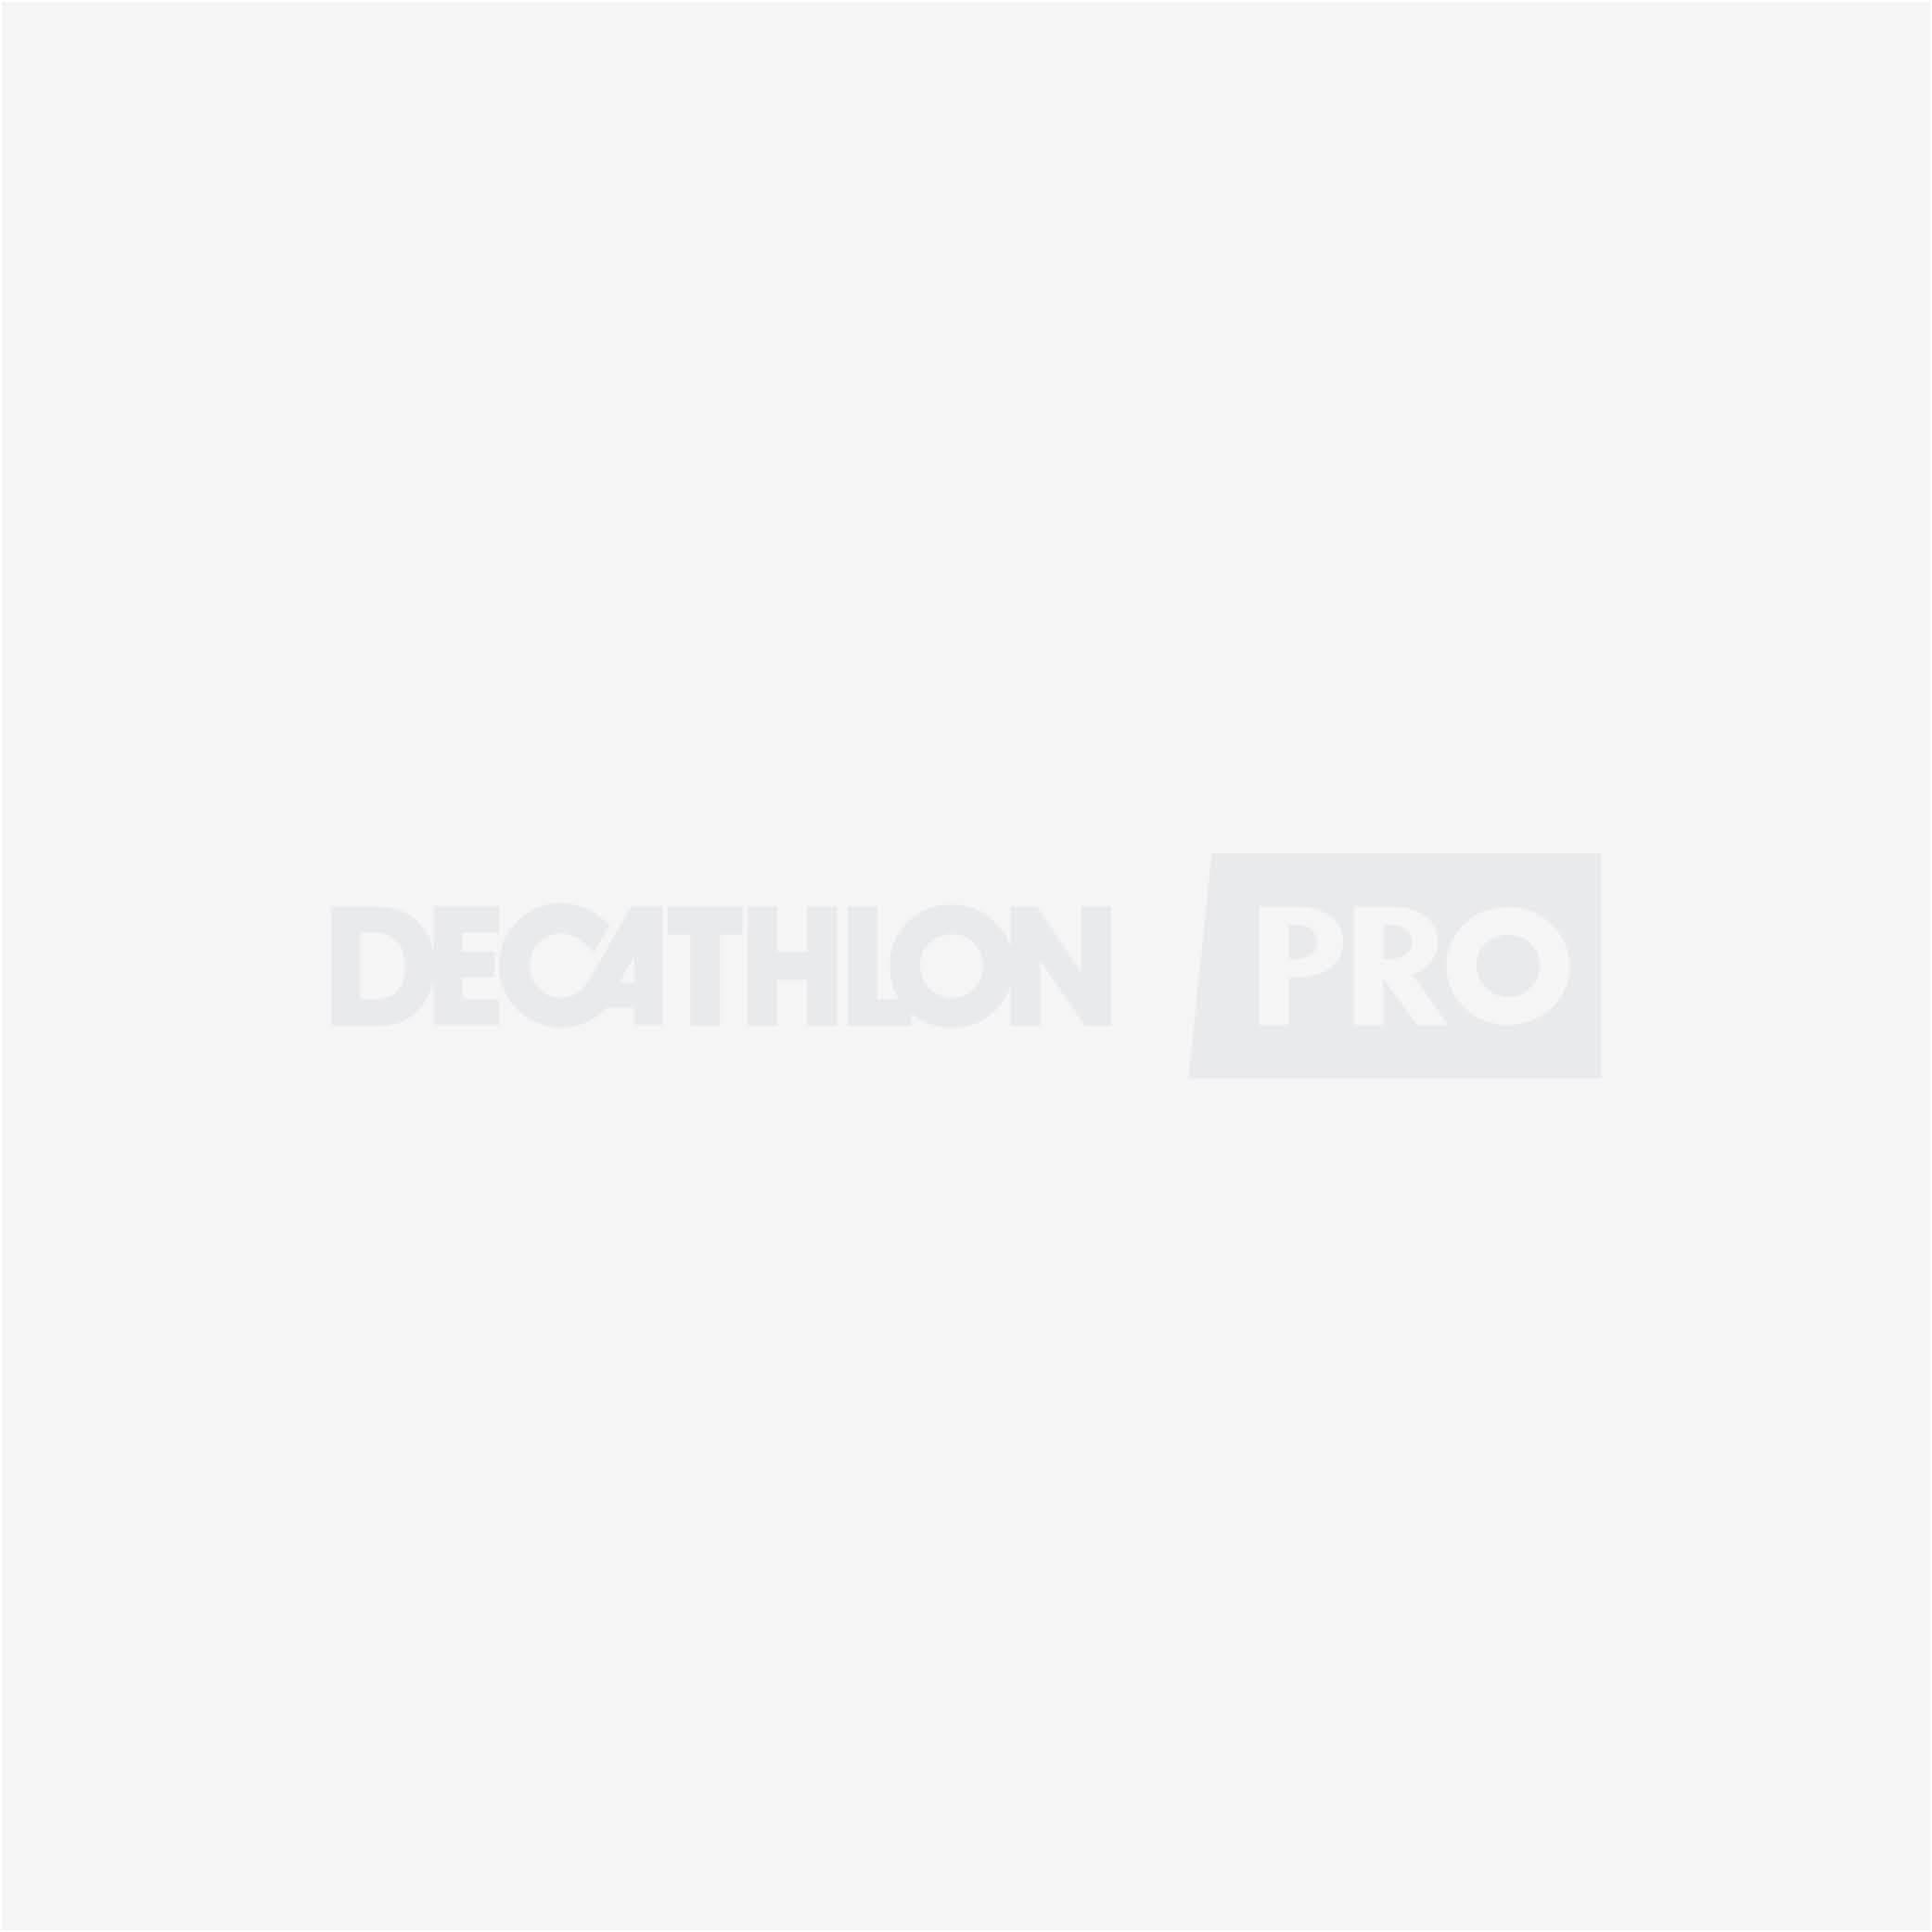 Offre Decathlon Pro 30 €